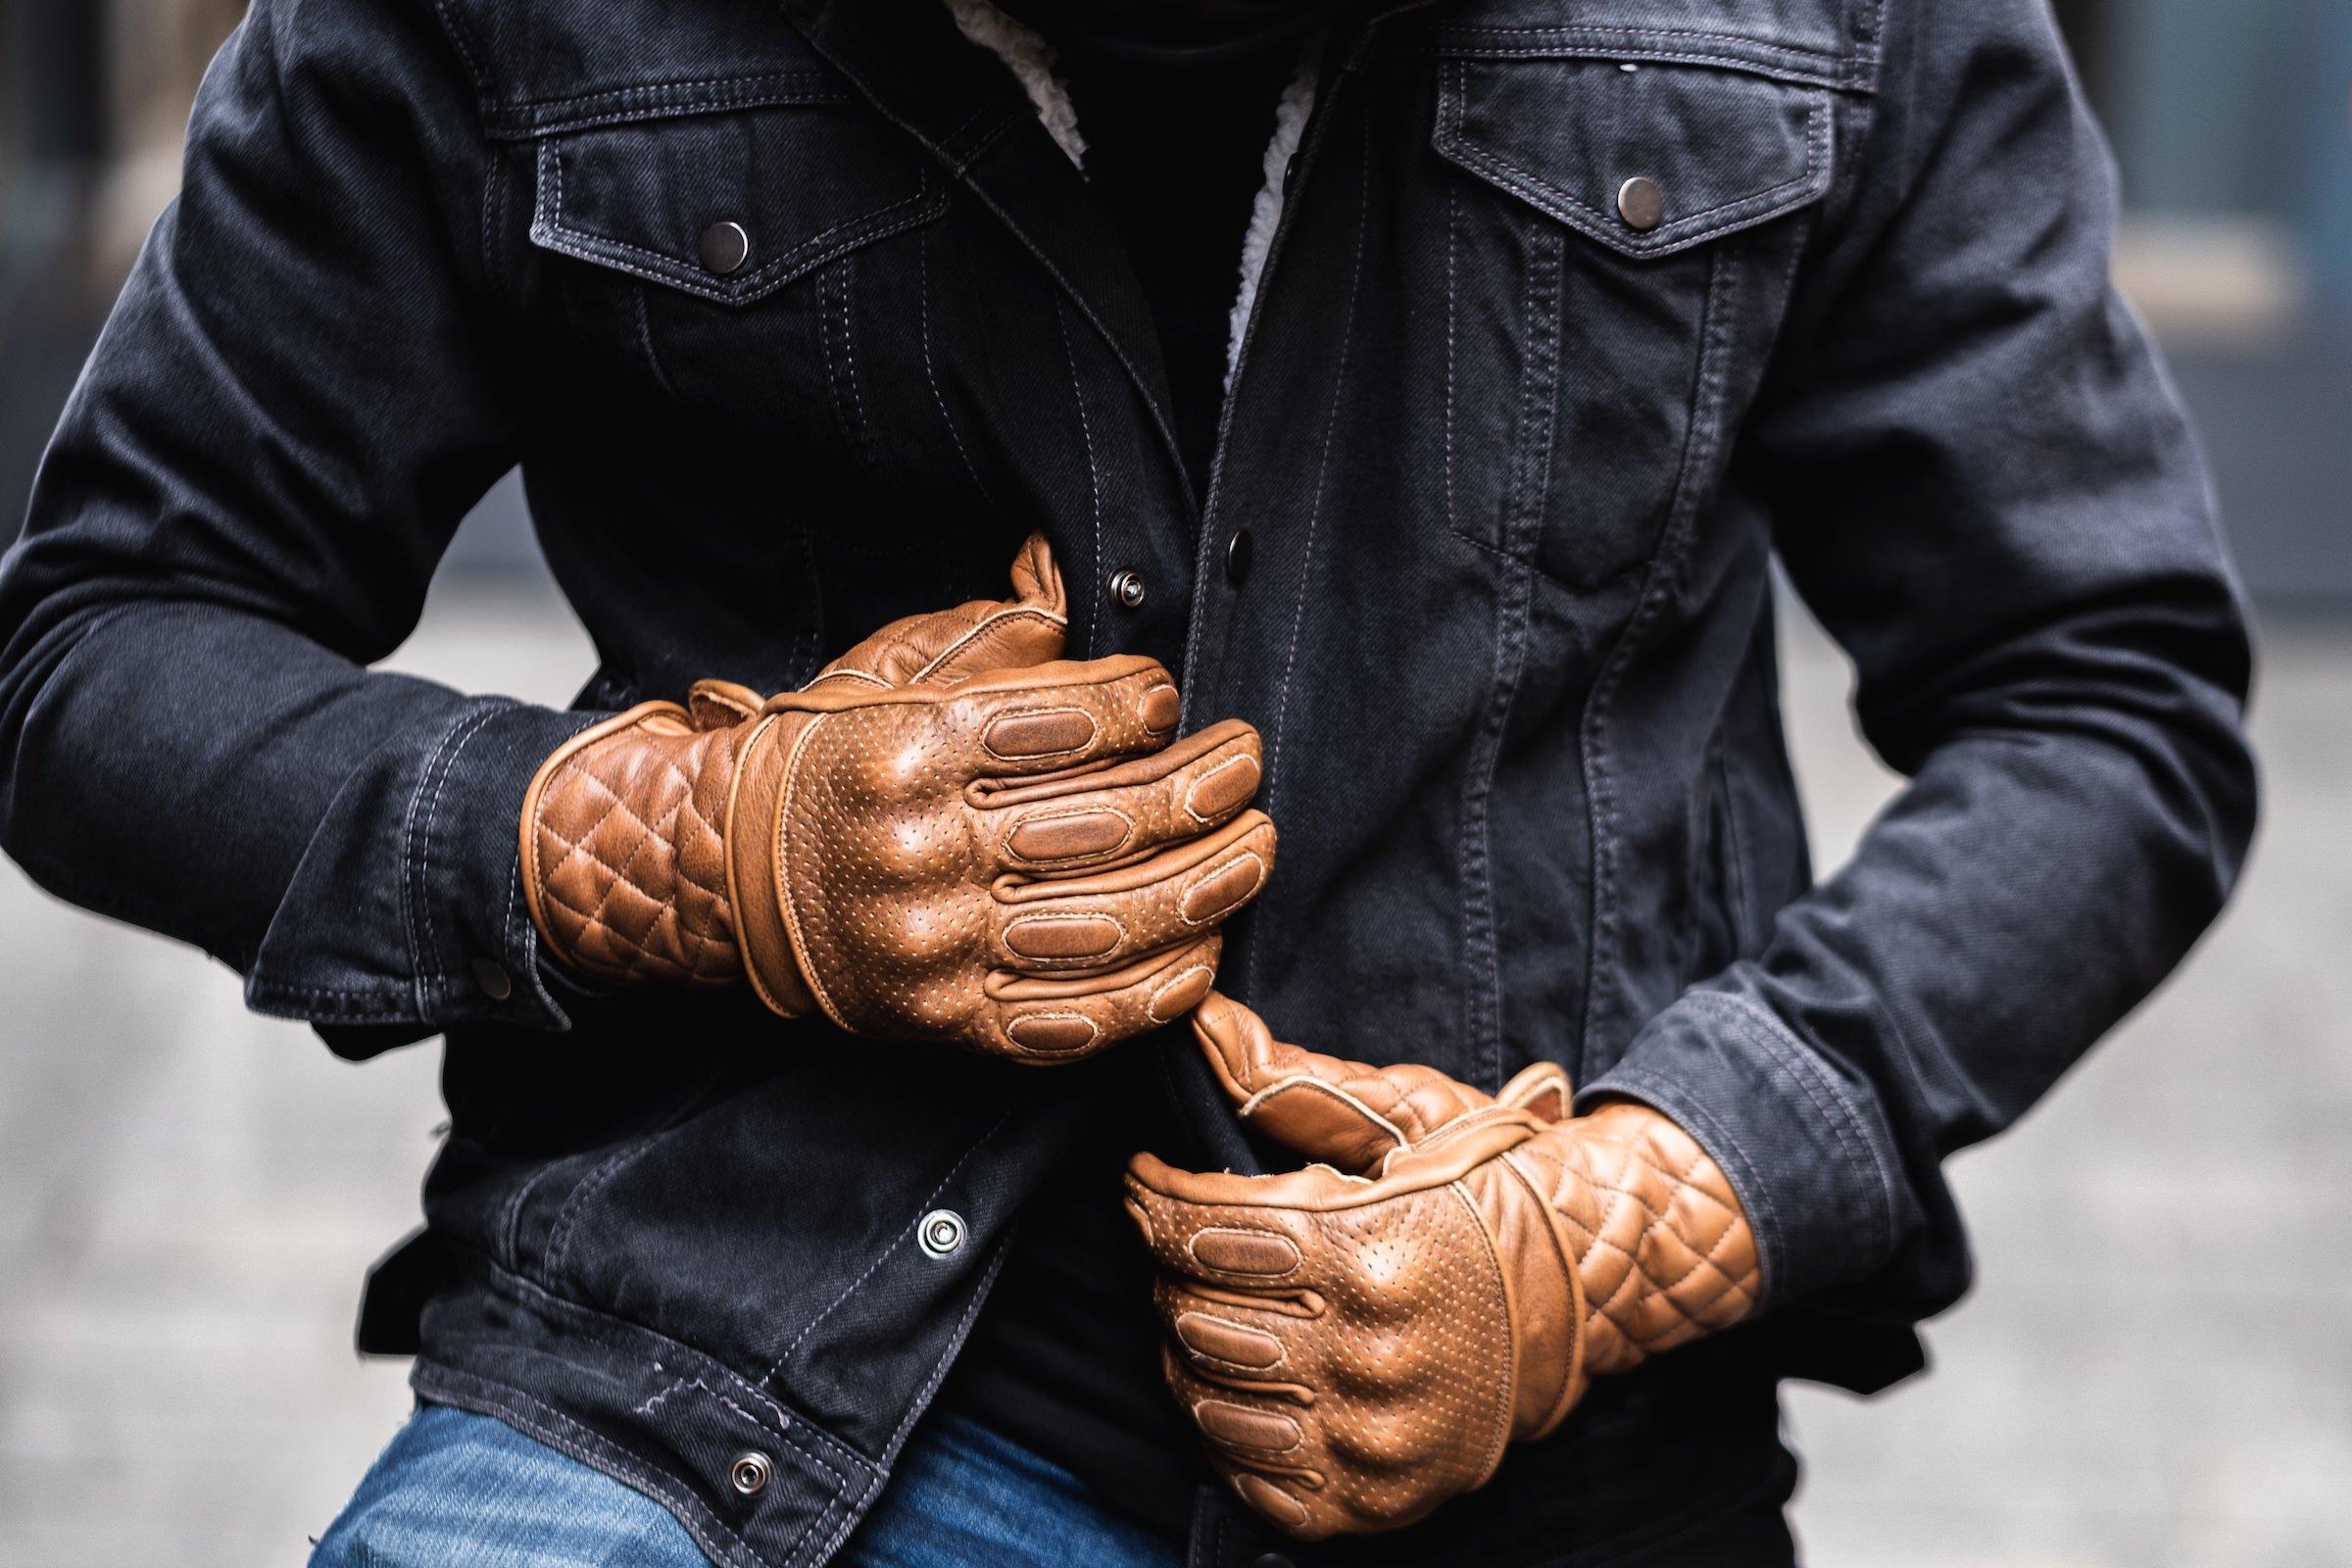 BSMC x Goldtop Motorcycle Gloves